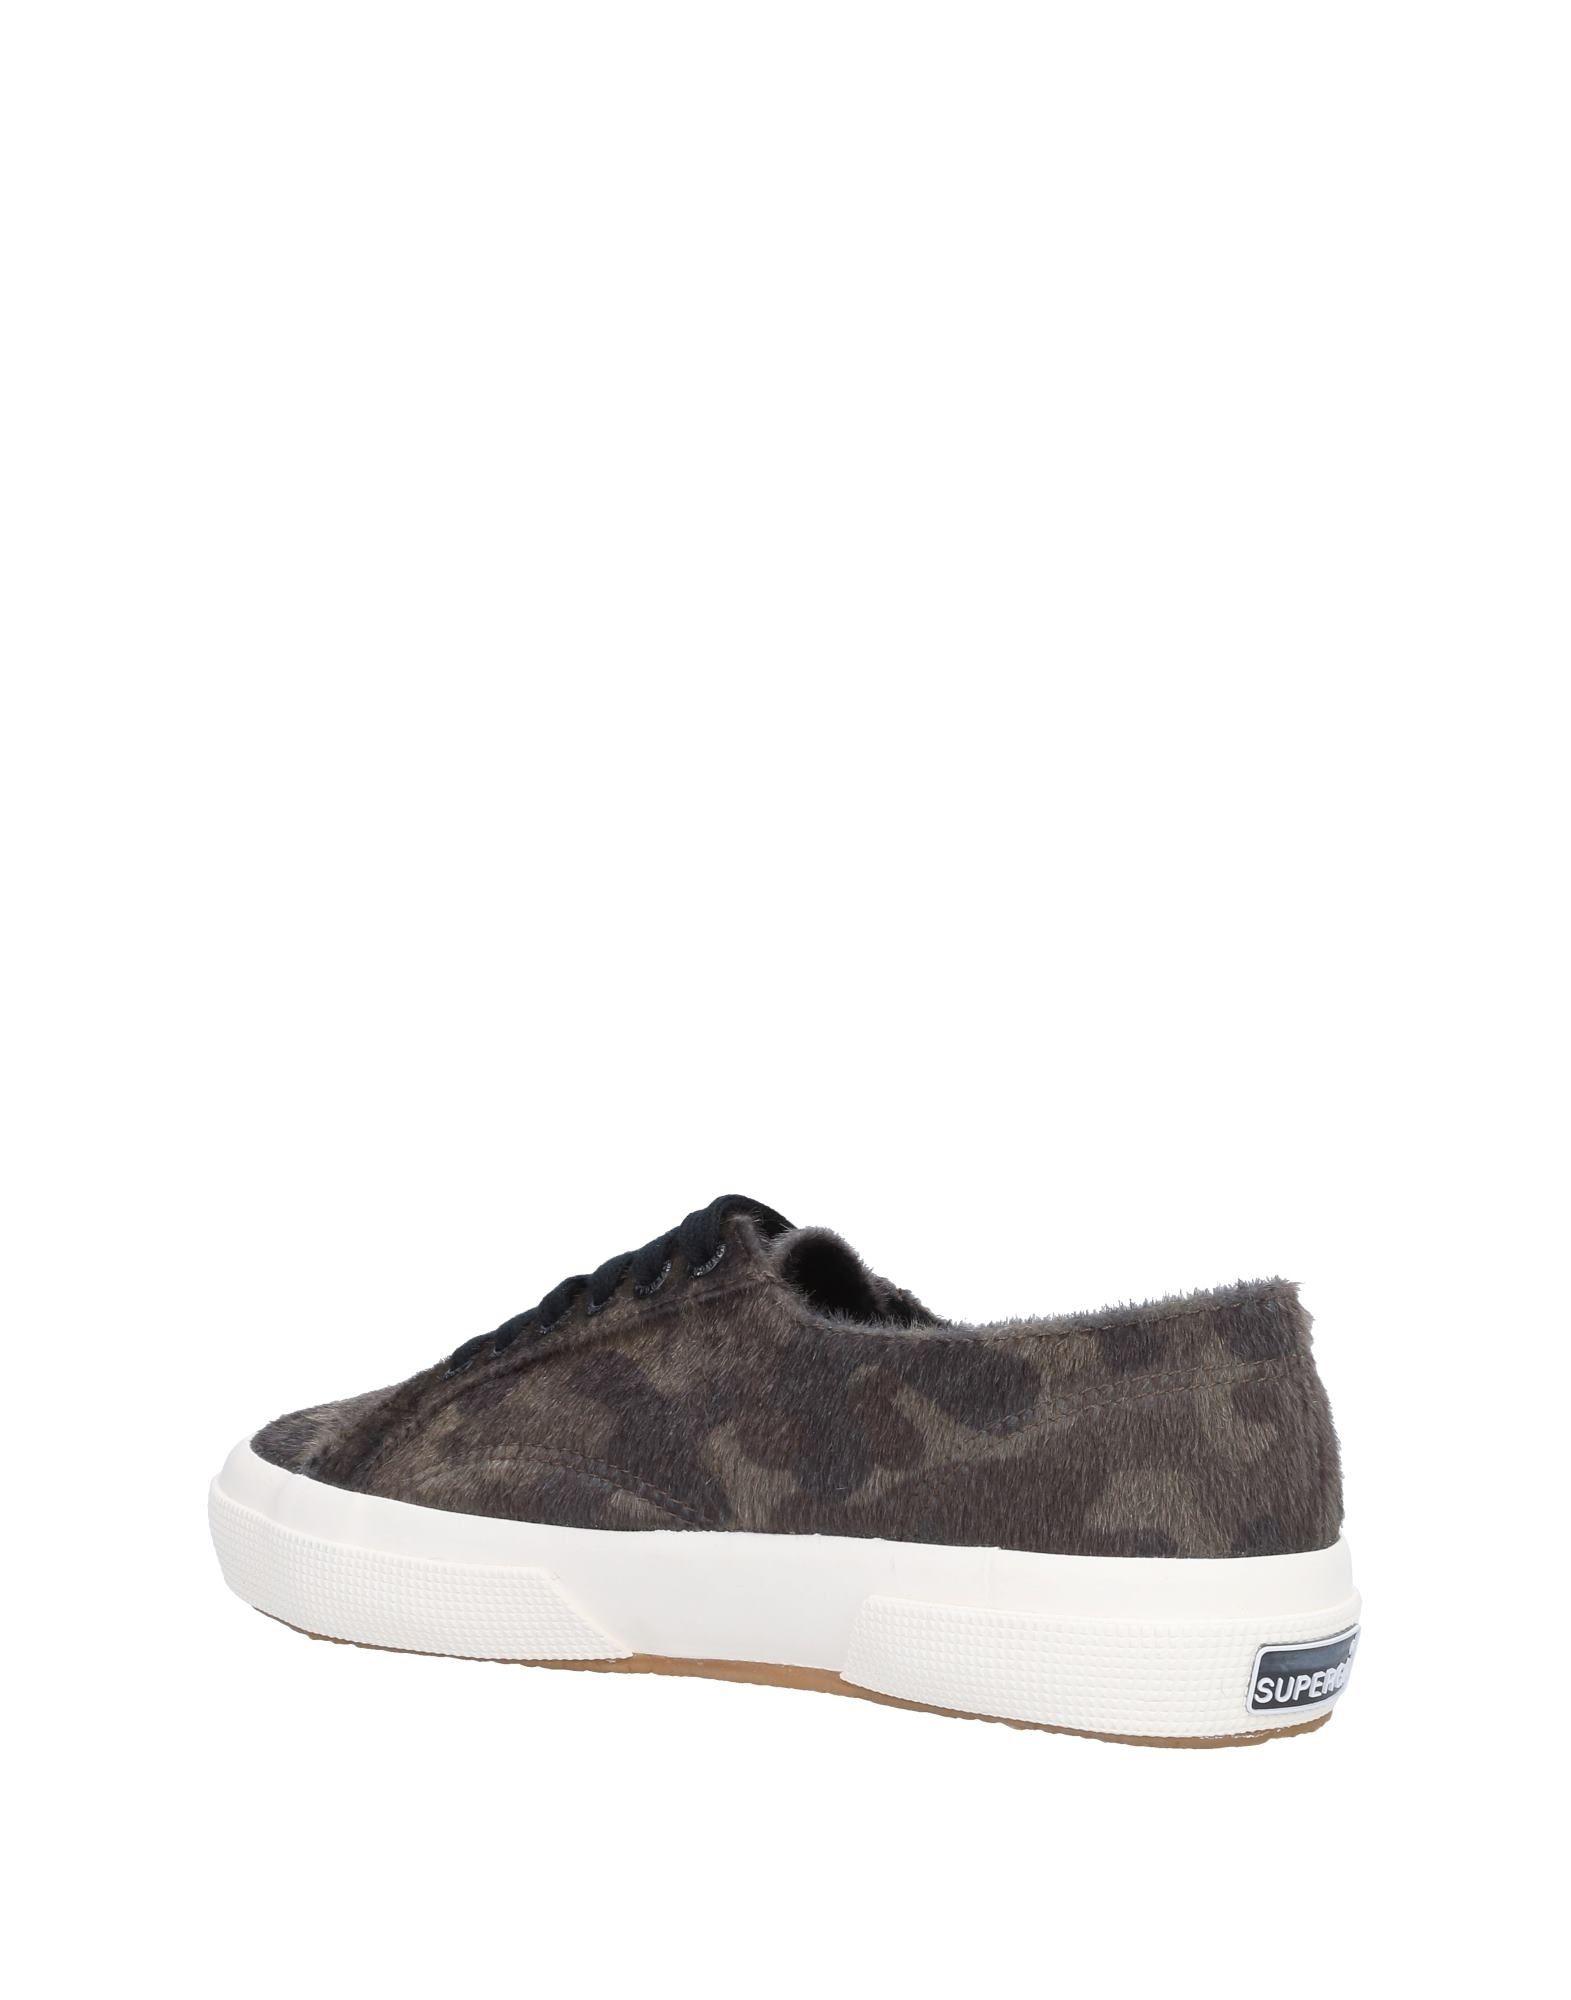 Superga® Gute Sneakers Damen  11491071UL Gute Superga® Qualität beliebte Schuhe ad6341